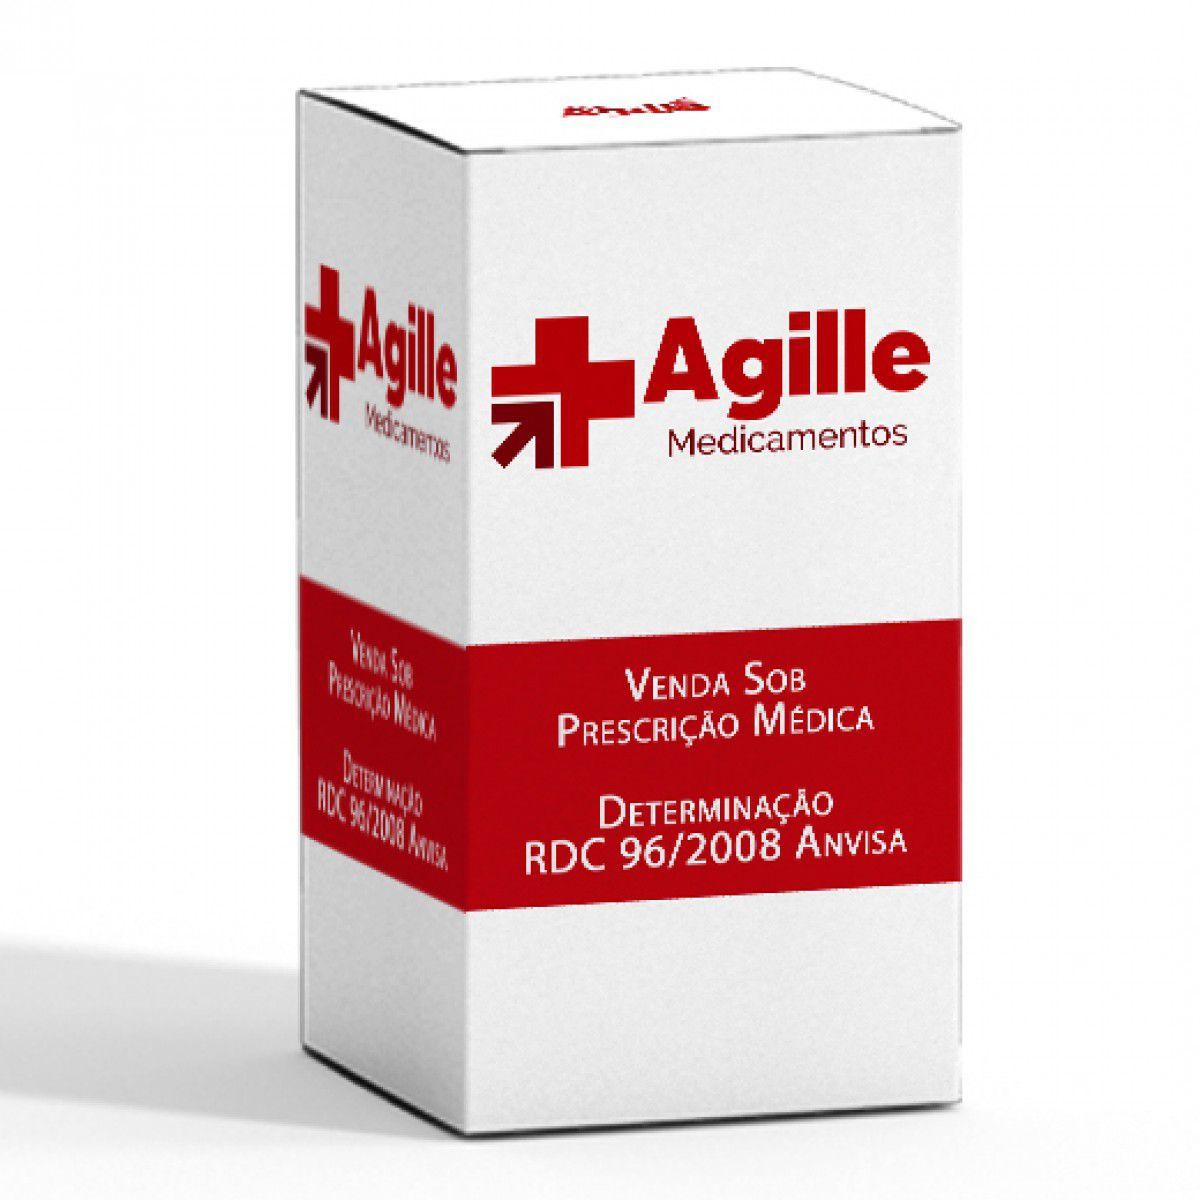 SANDIMMUN NEORAL 100MG (C/50 CPS GELATINA MOLE)  - Agille Speciality